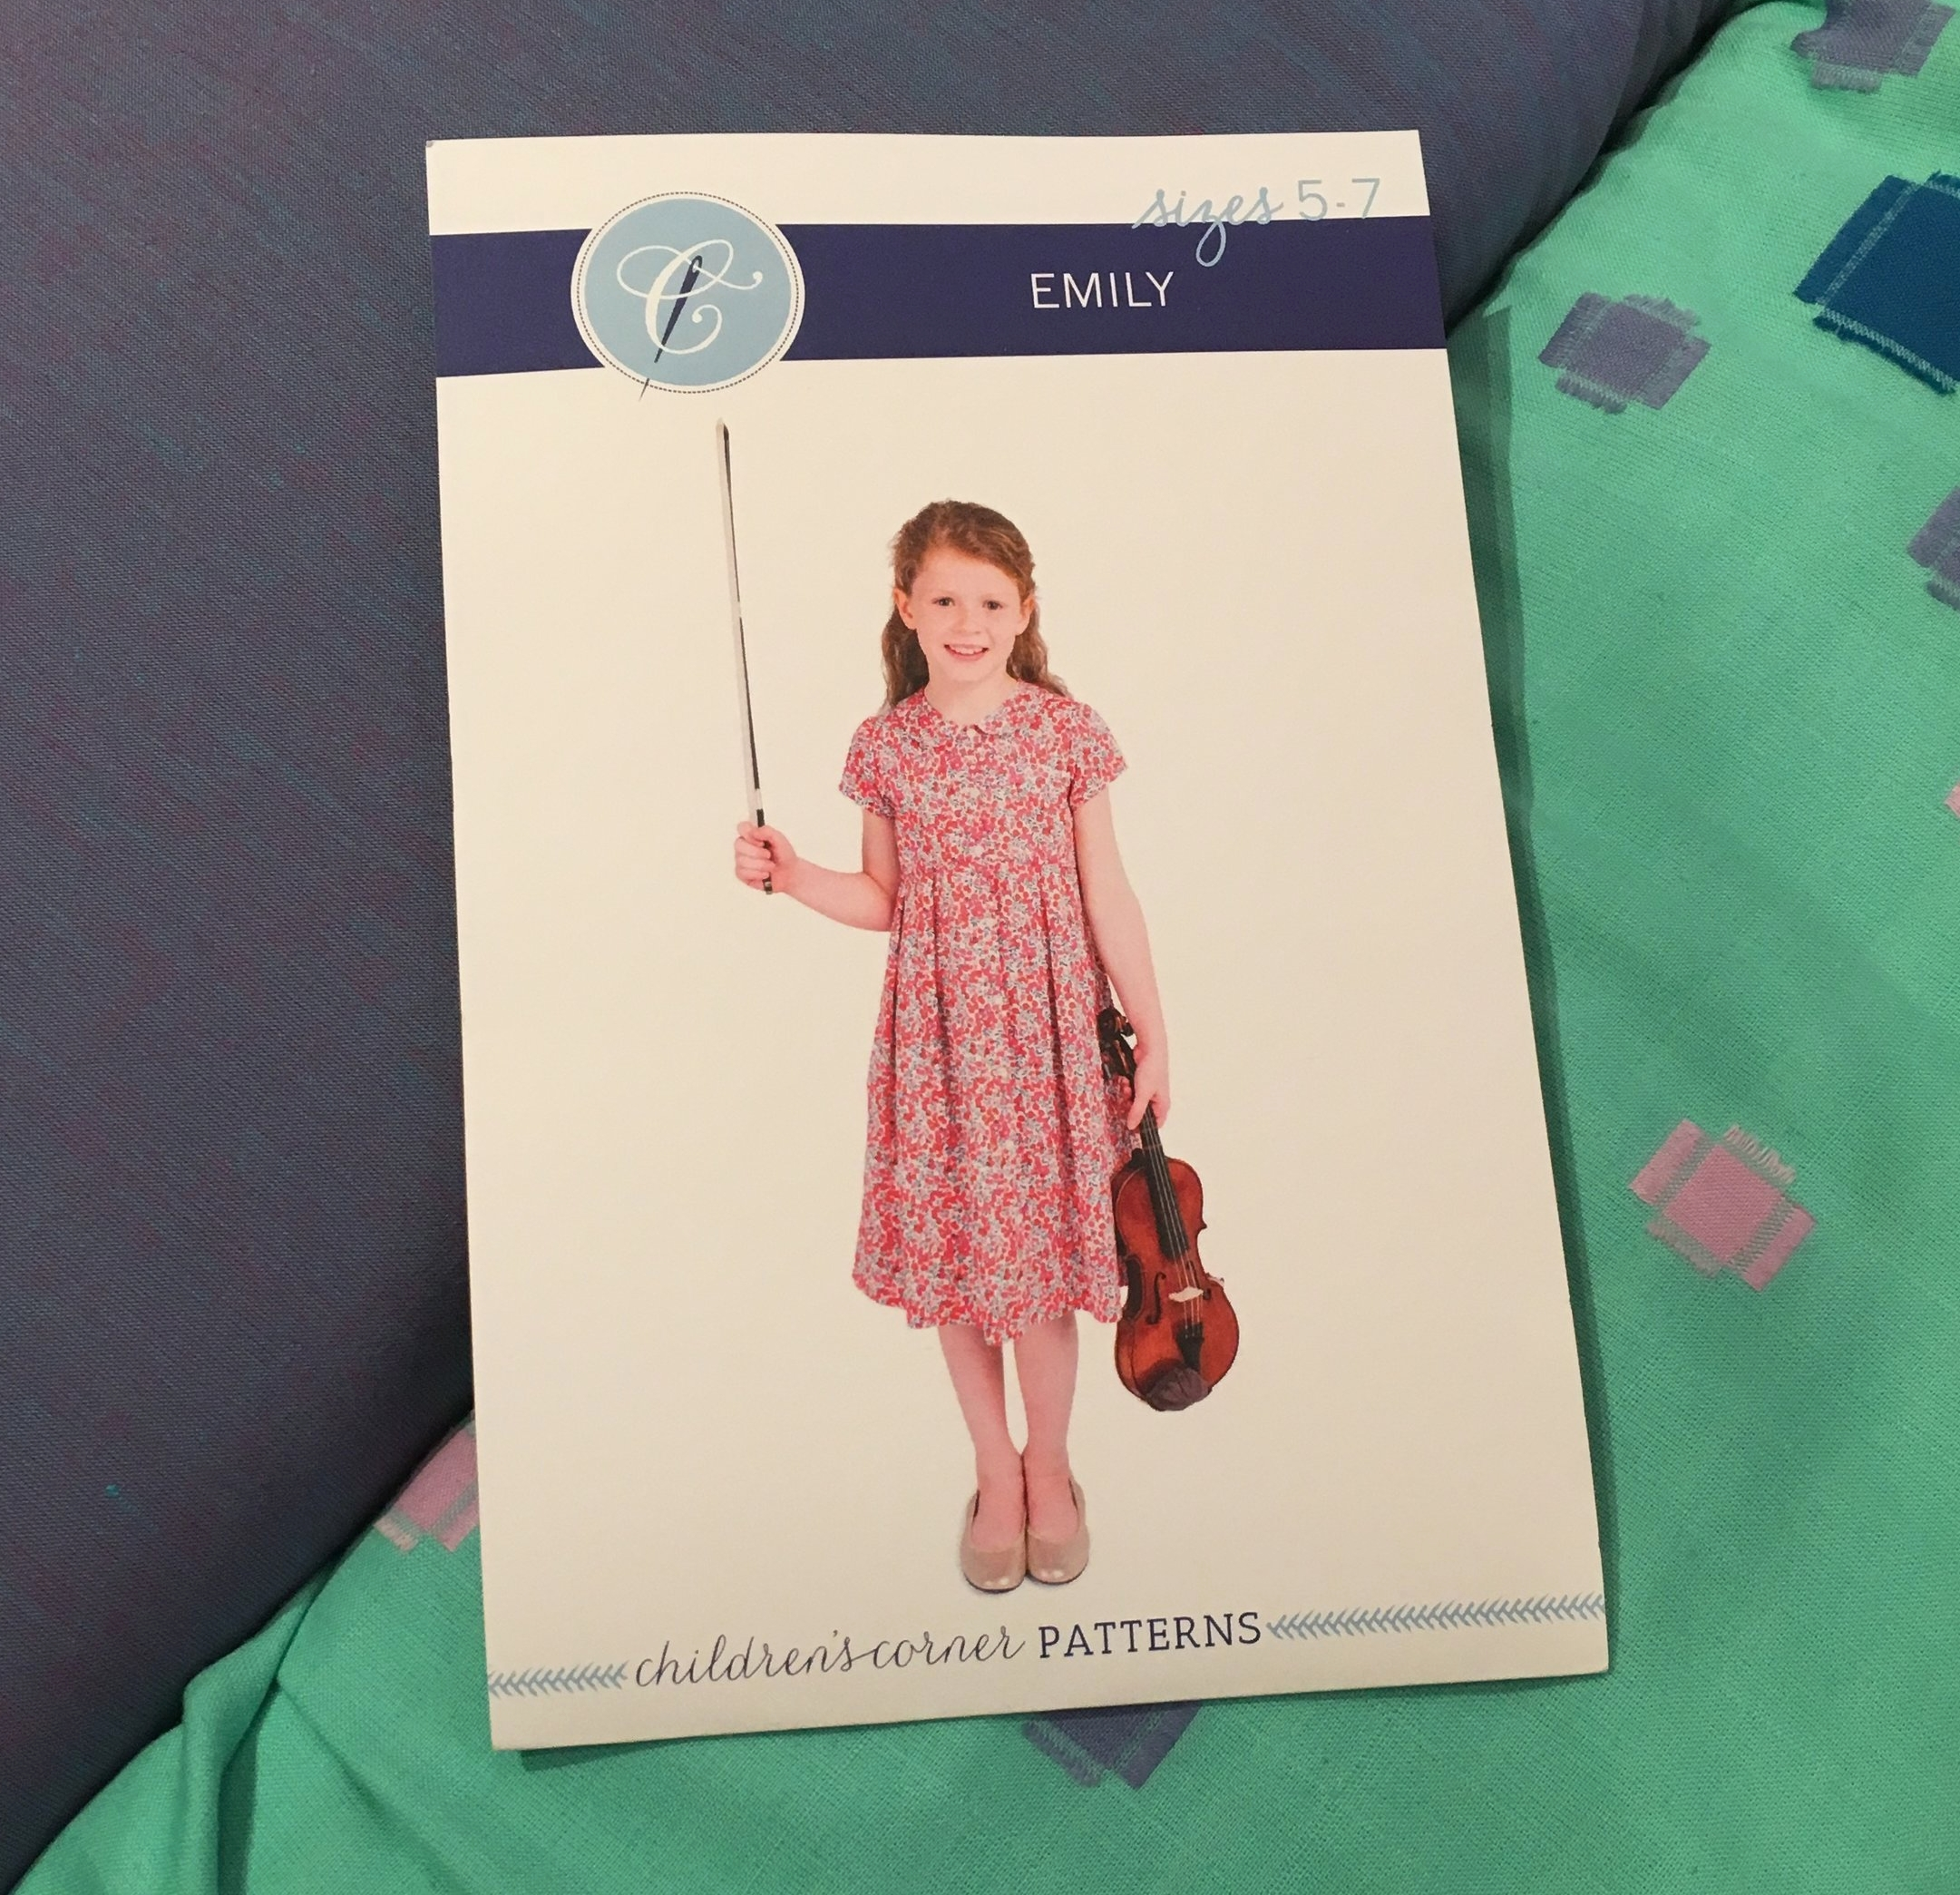 Children's Corner Patters: Emily Dress